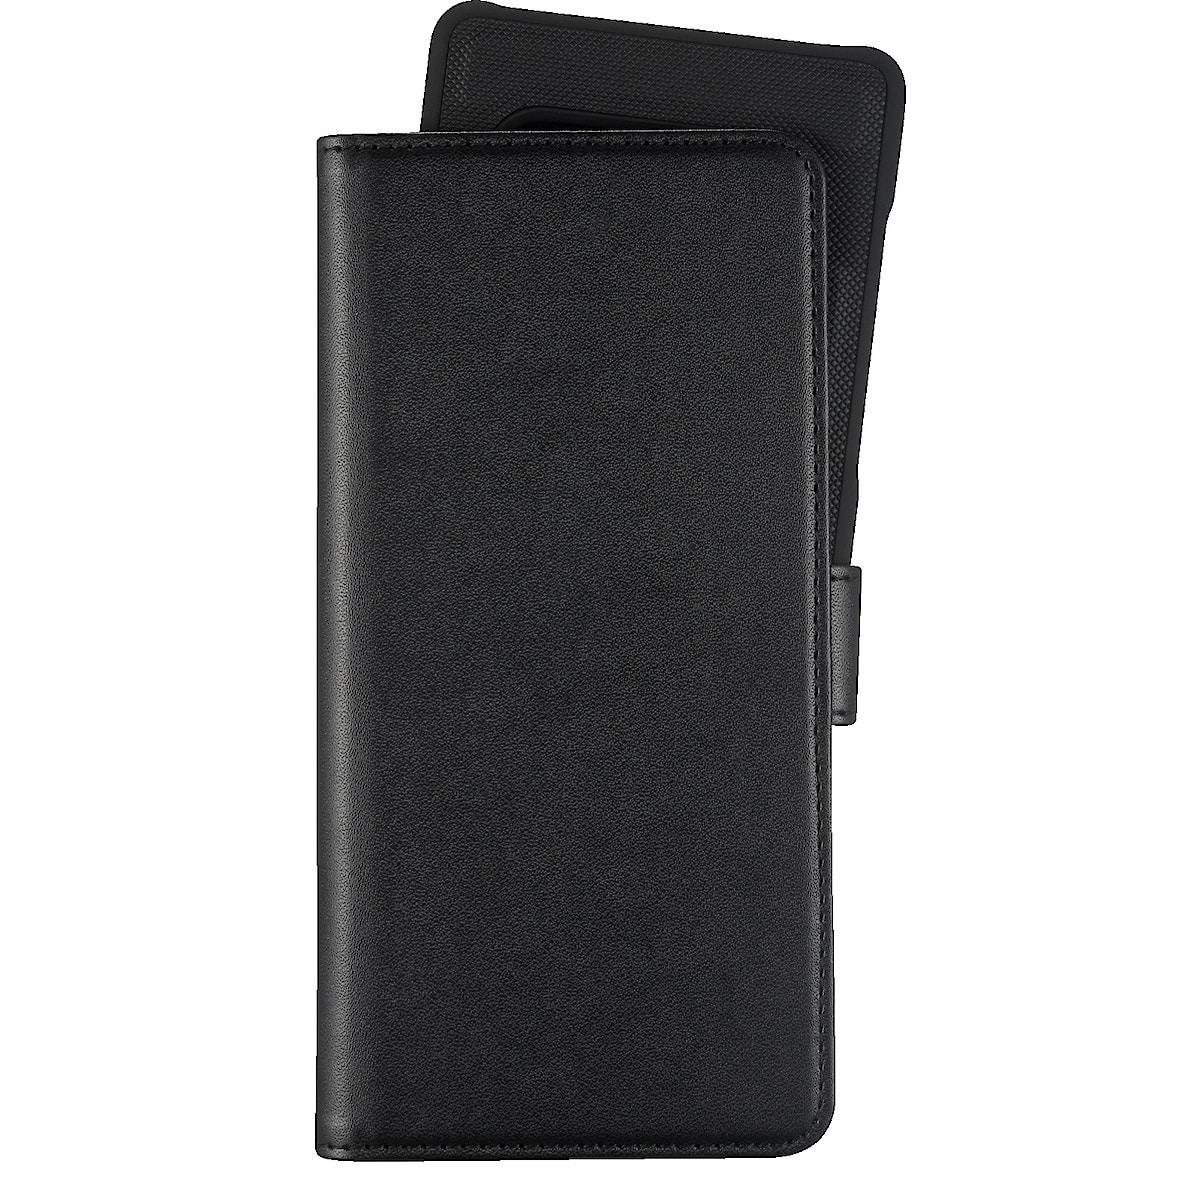 Plånboksfodral för Samsung Galaxy S10 Plus Holdit